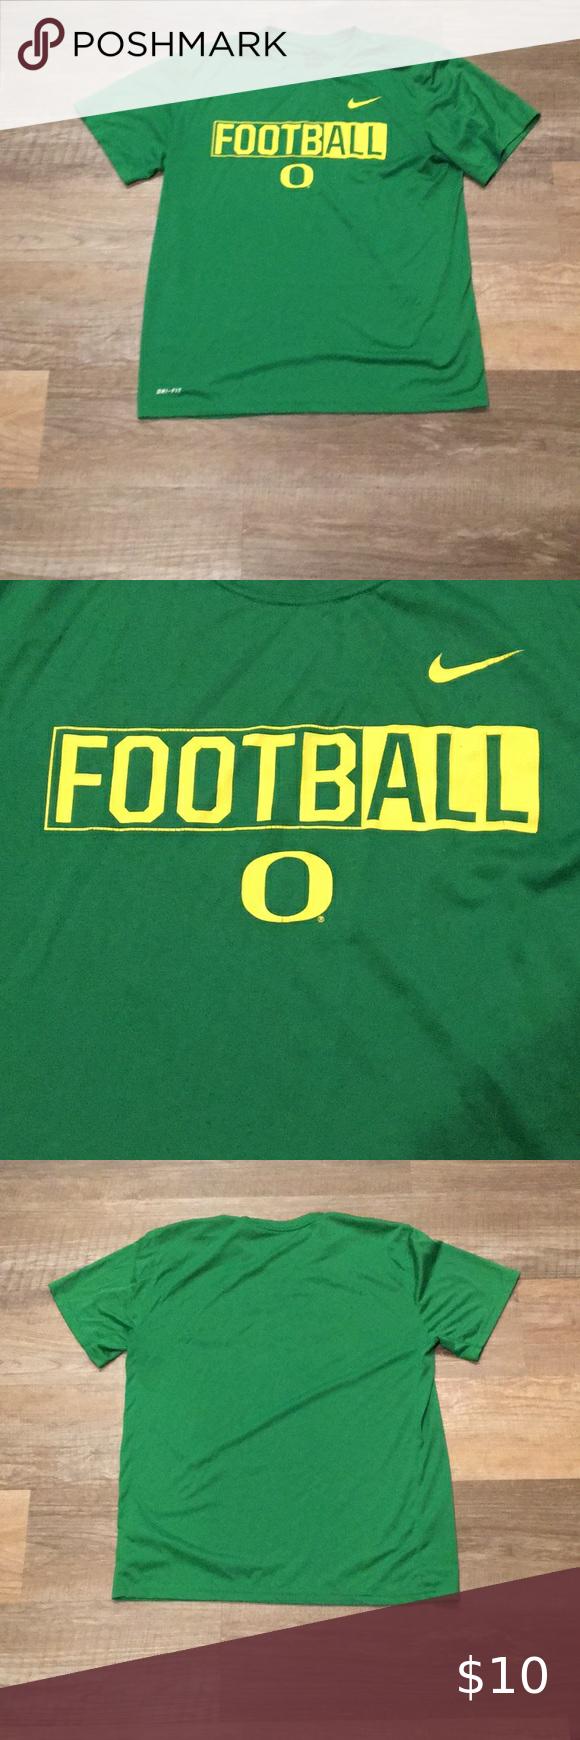 Oregon Ducks Football Nike Dri Fit Shirt Large Workout Shirts Dri Fit Shirt Oregon Ducks [ 1740 x 580 Pixel ]